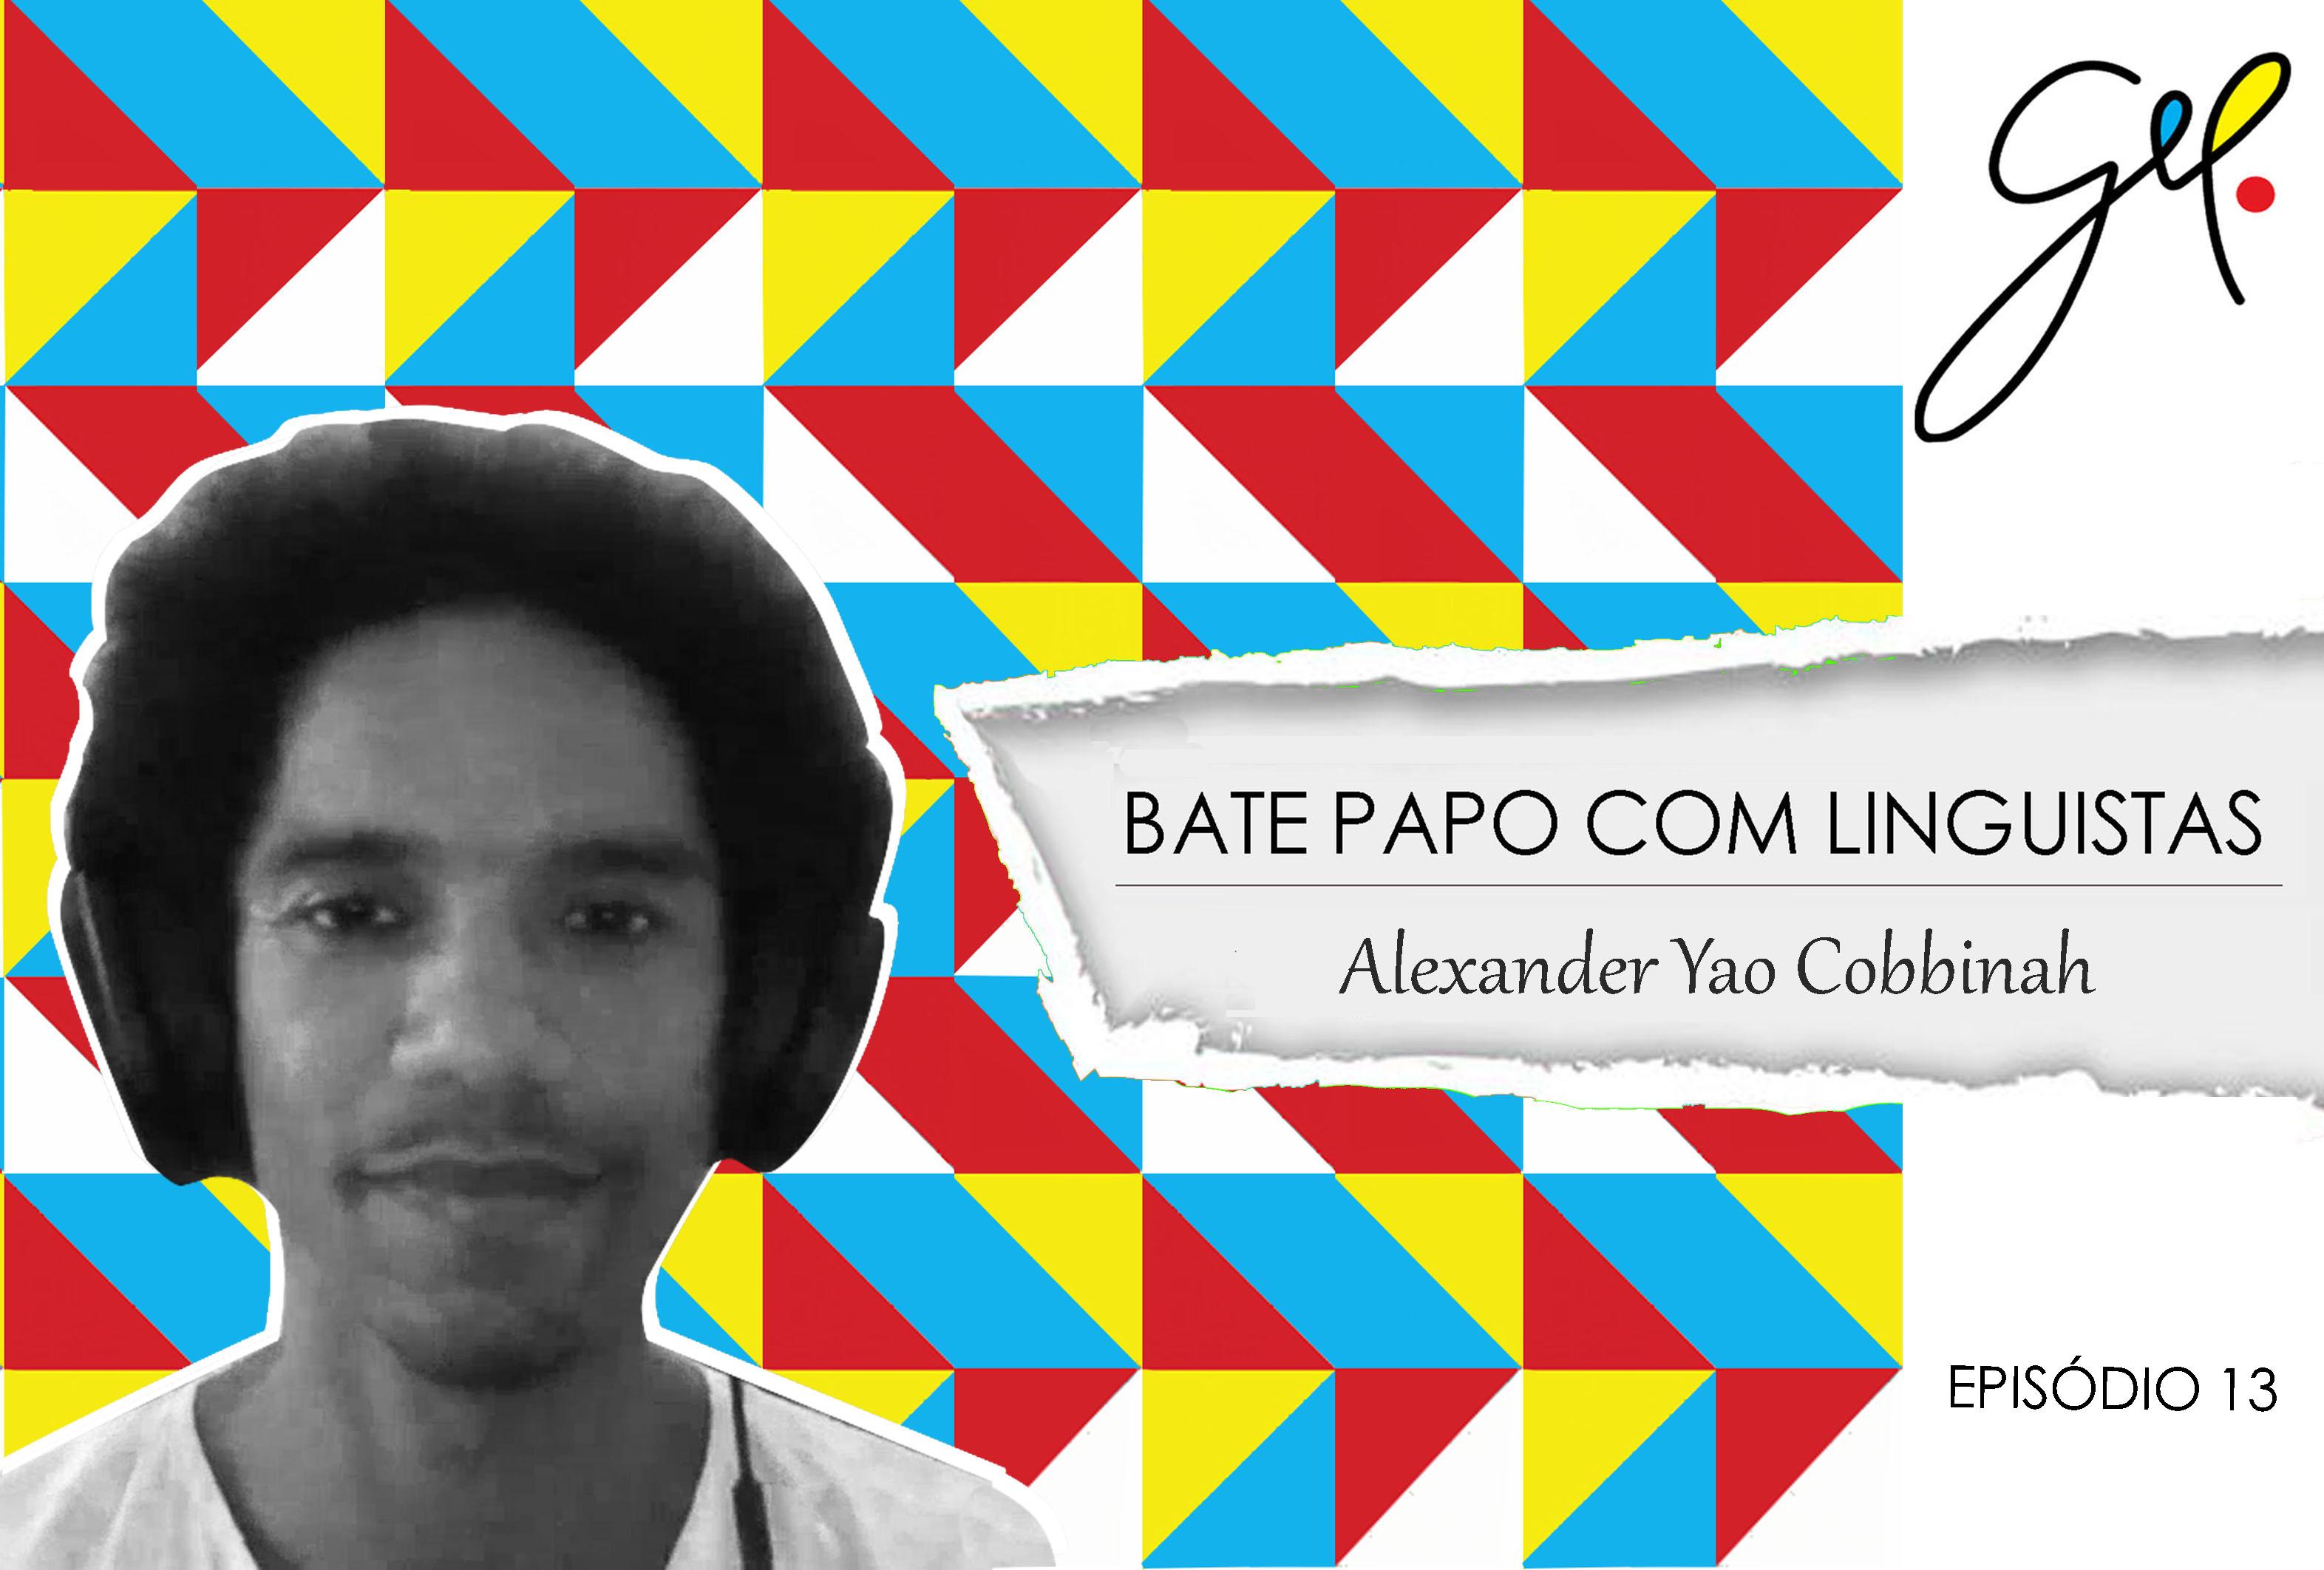 EP13 | Conversa com Alexander Yao Cobbinah